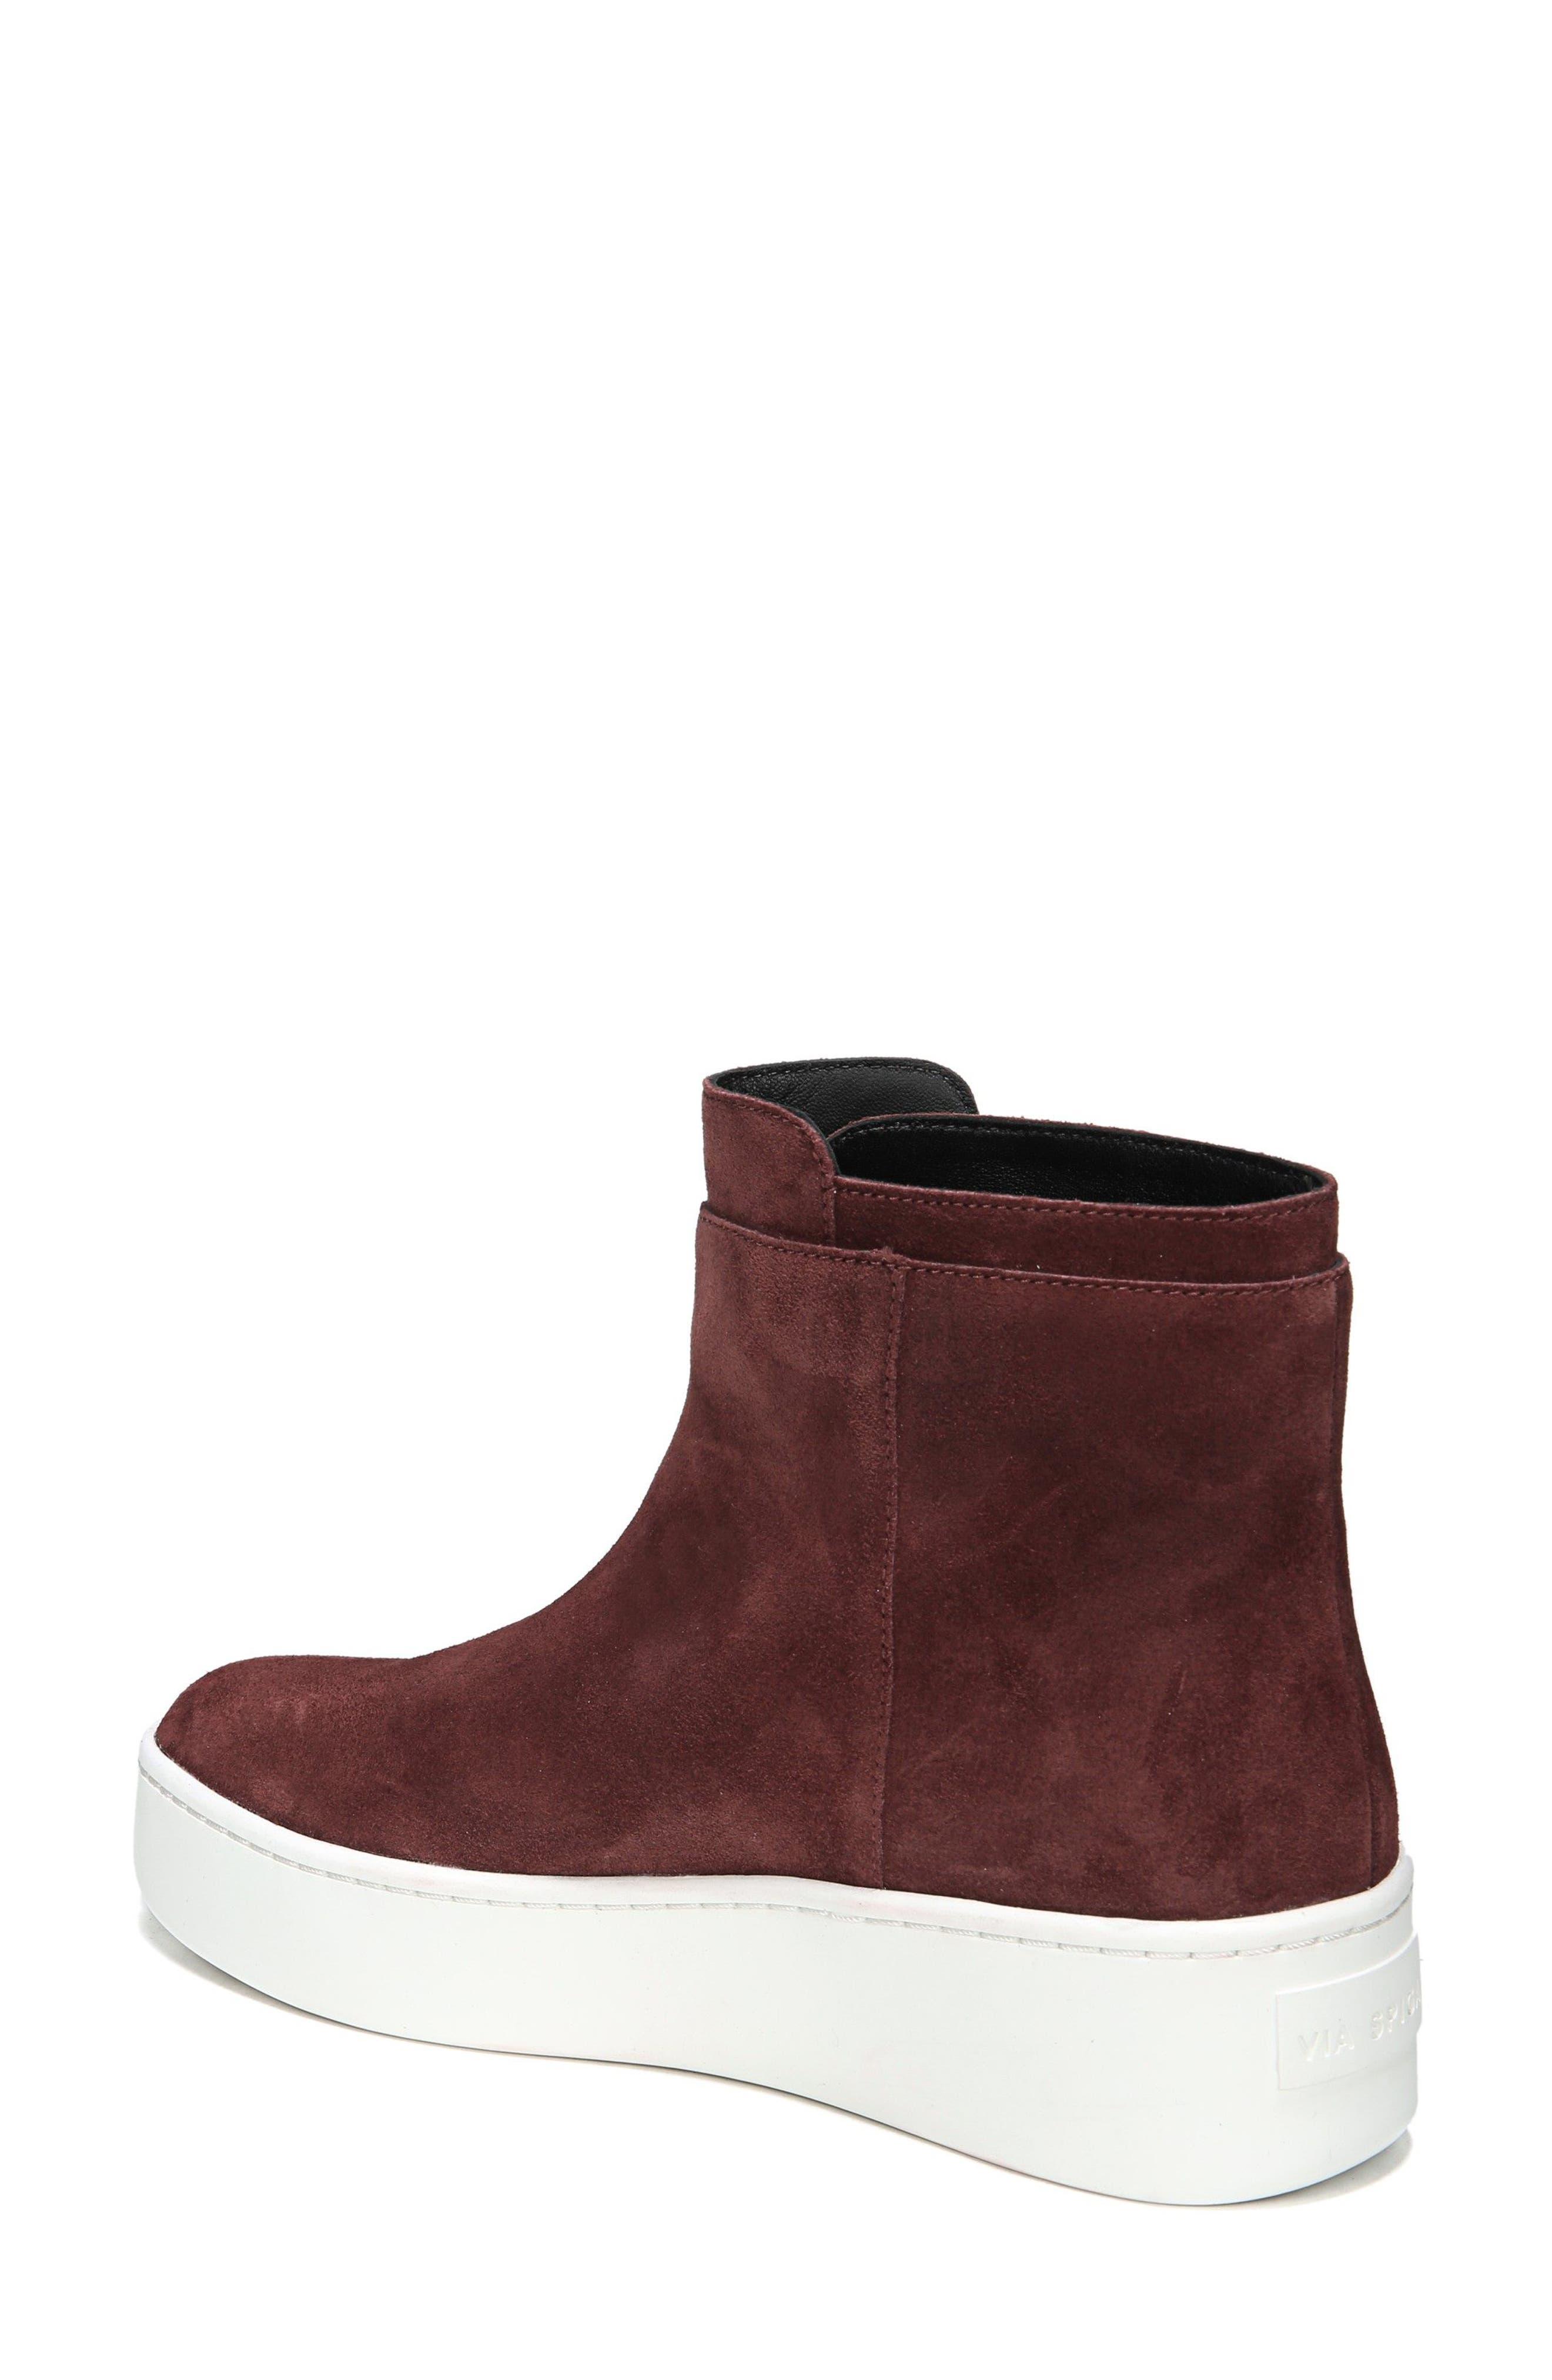 Easton High Top Sneaker,                             Alternate thumbnail 6, color,